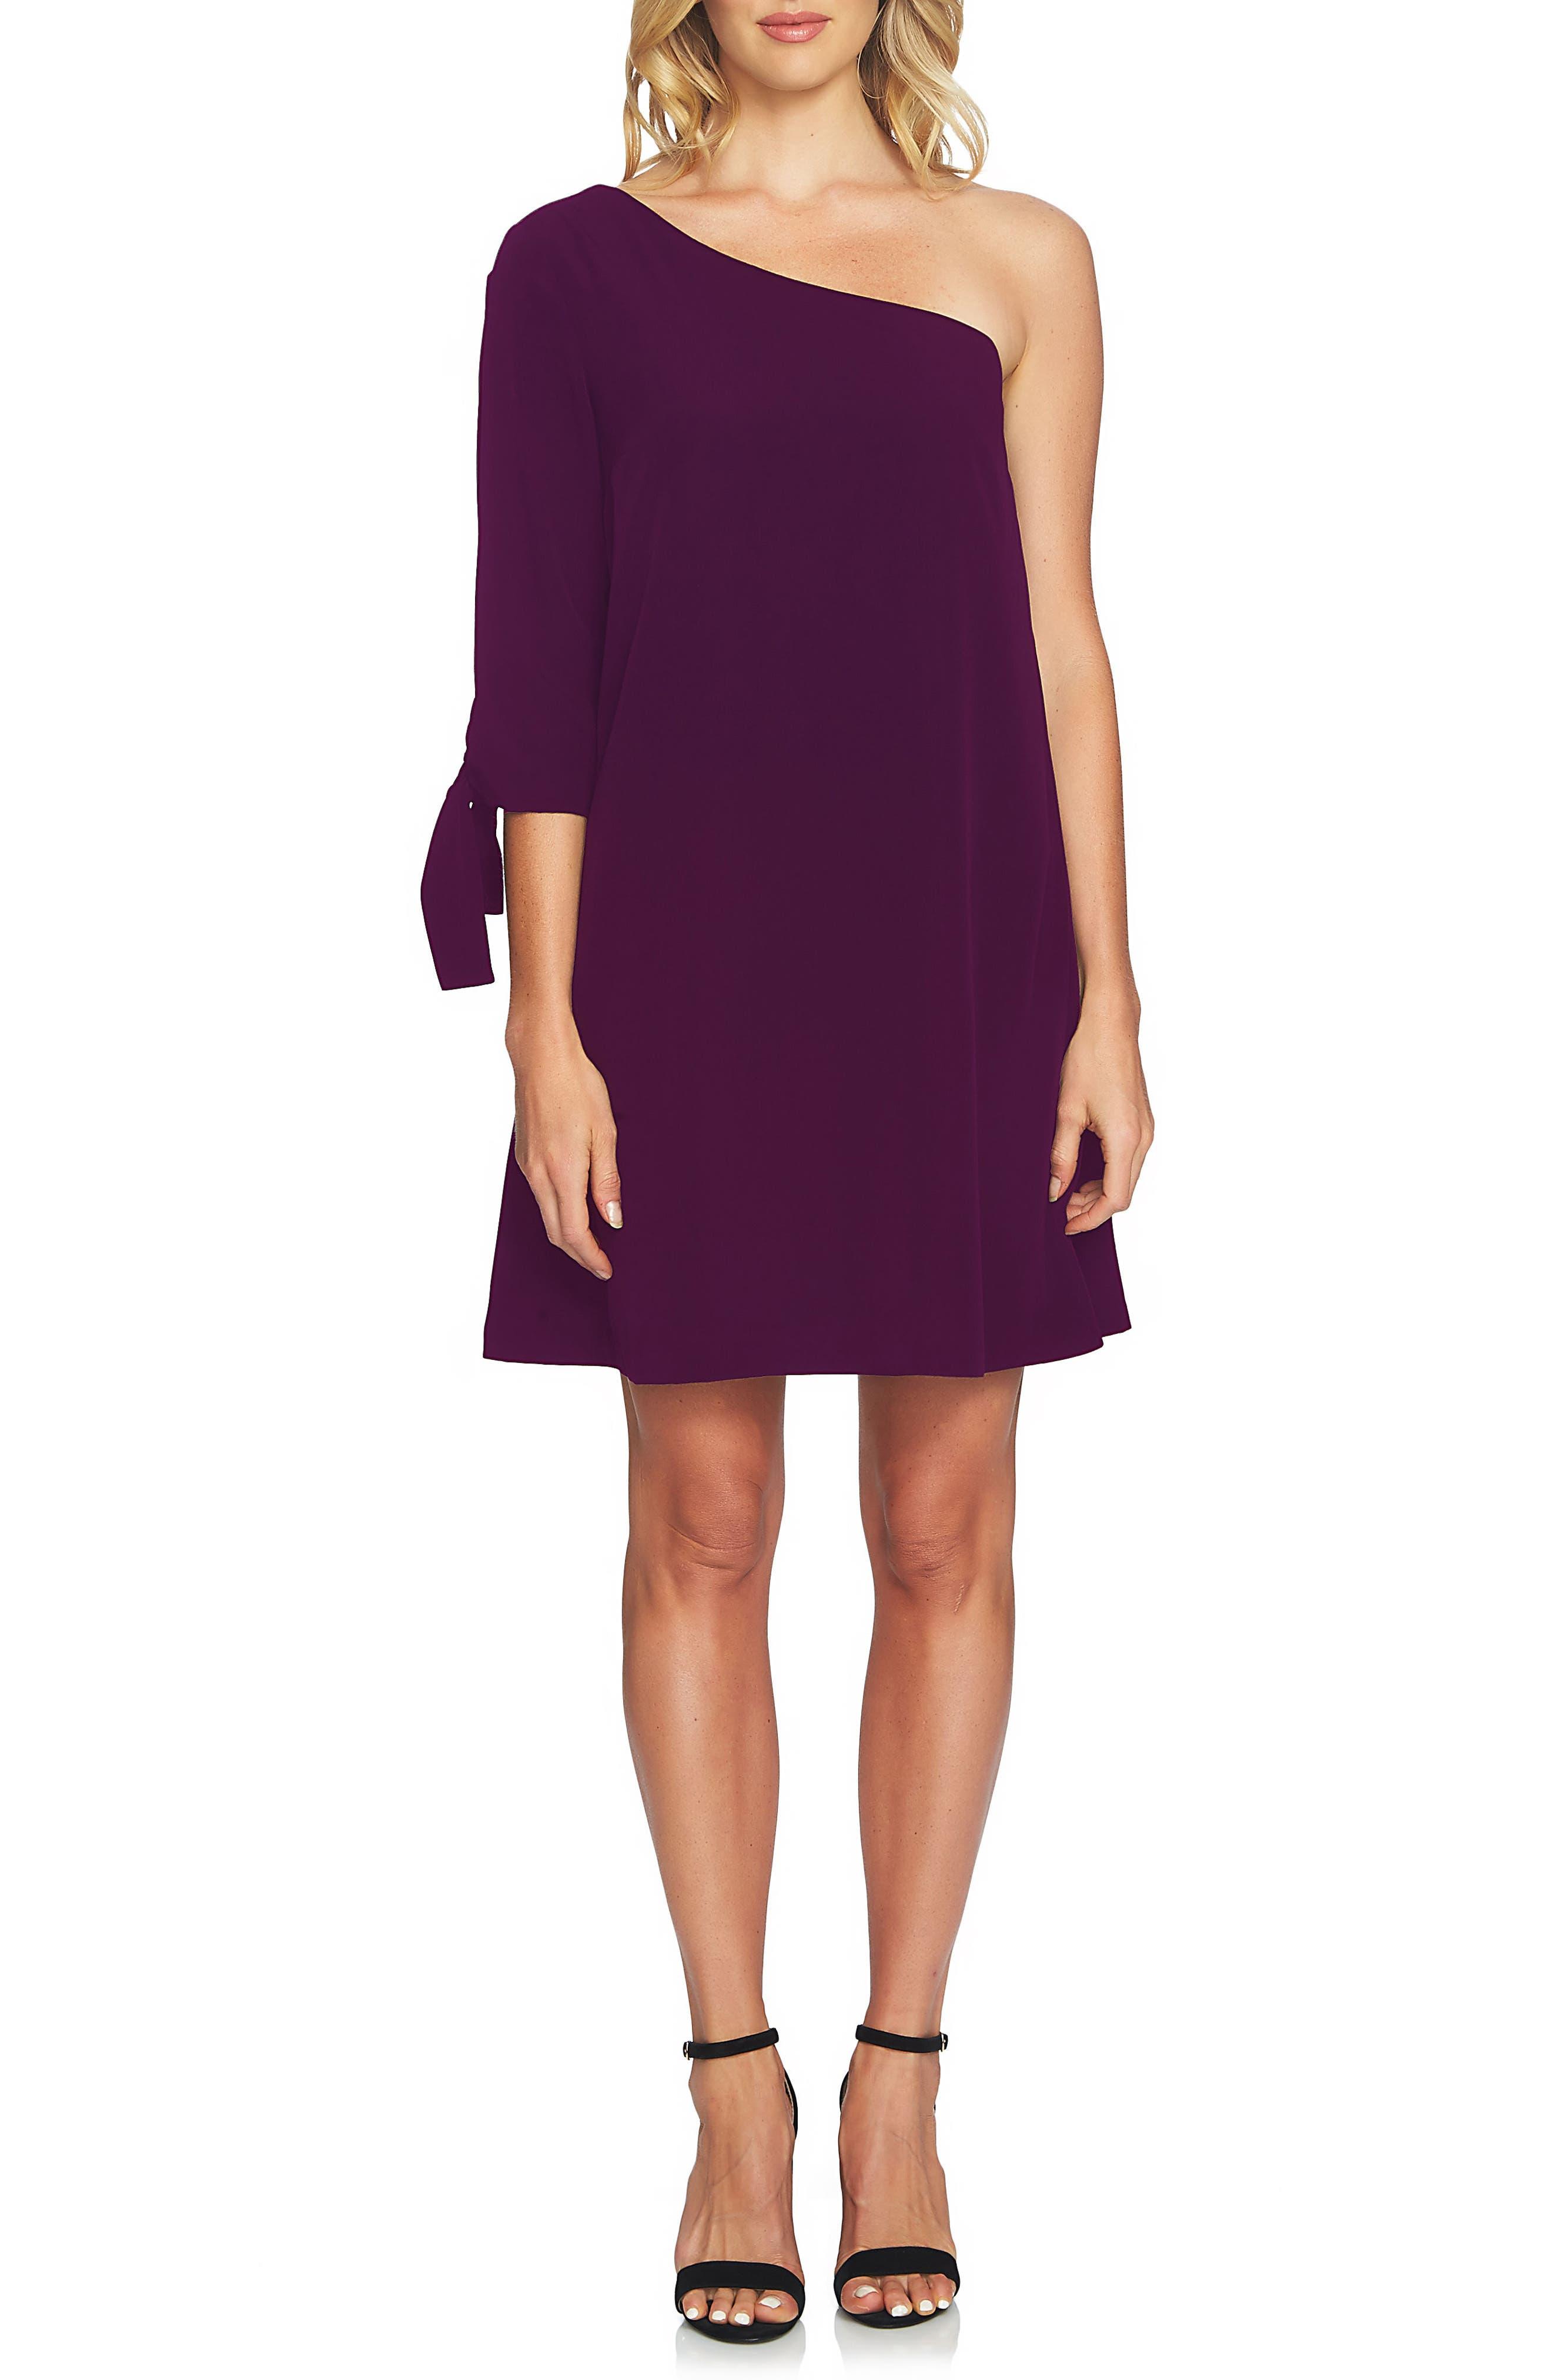 CeCe Sophia One-Shoulder Shift Dress